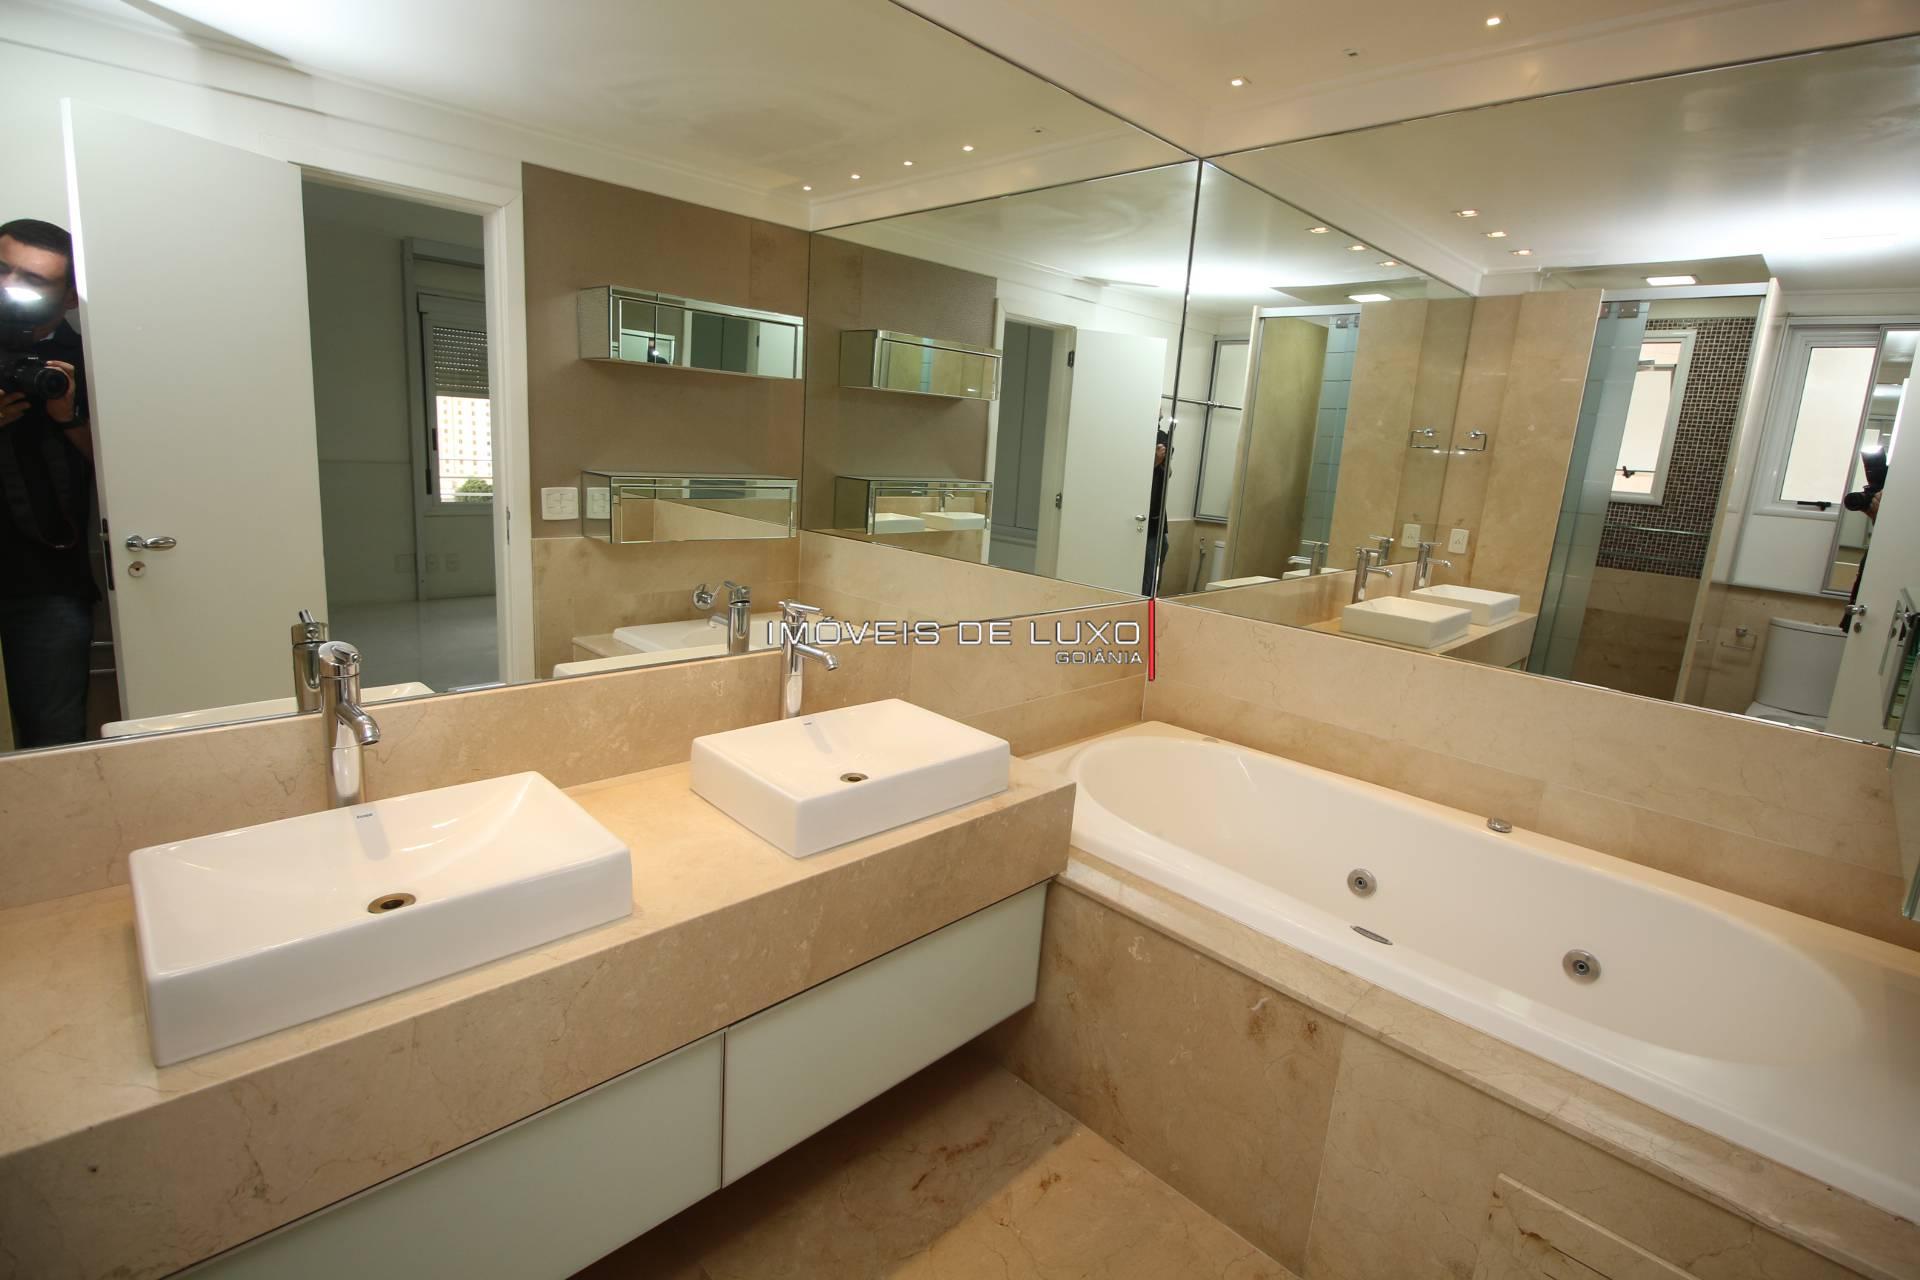 Imóveis de Luxo - Apartamento Ventana Del Sol setor oeste